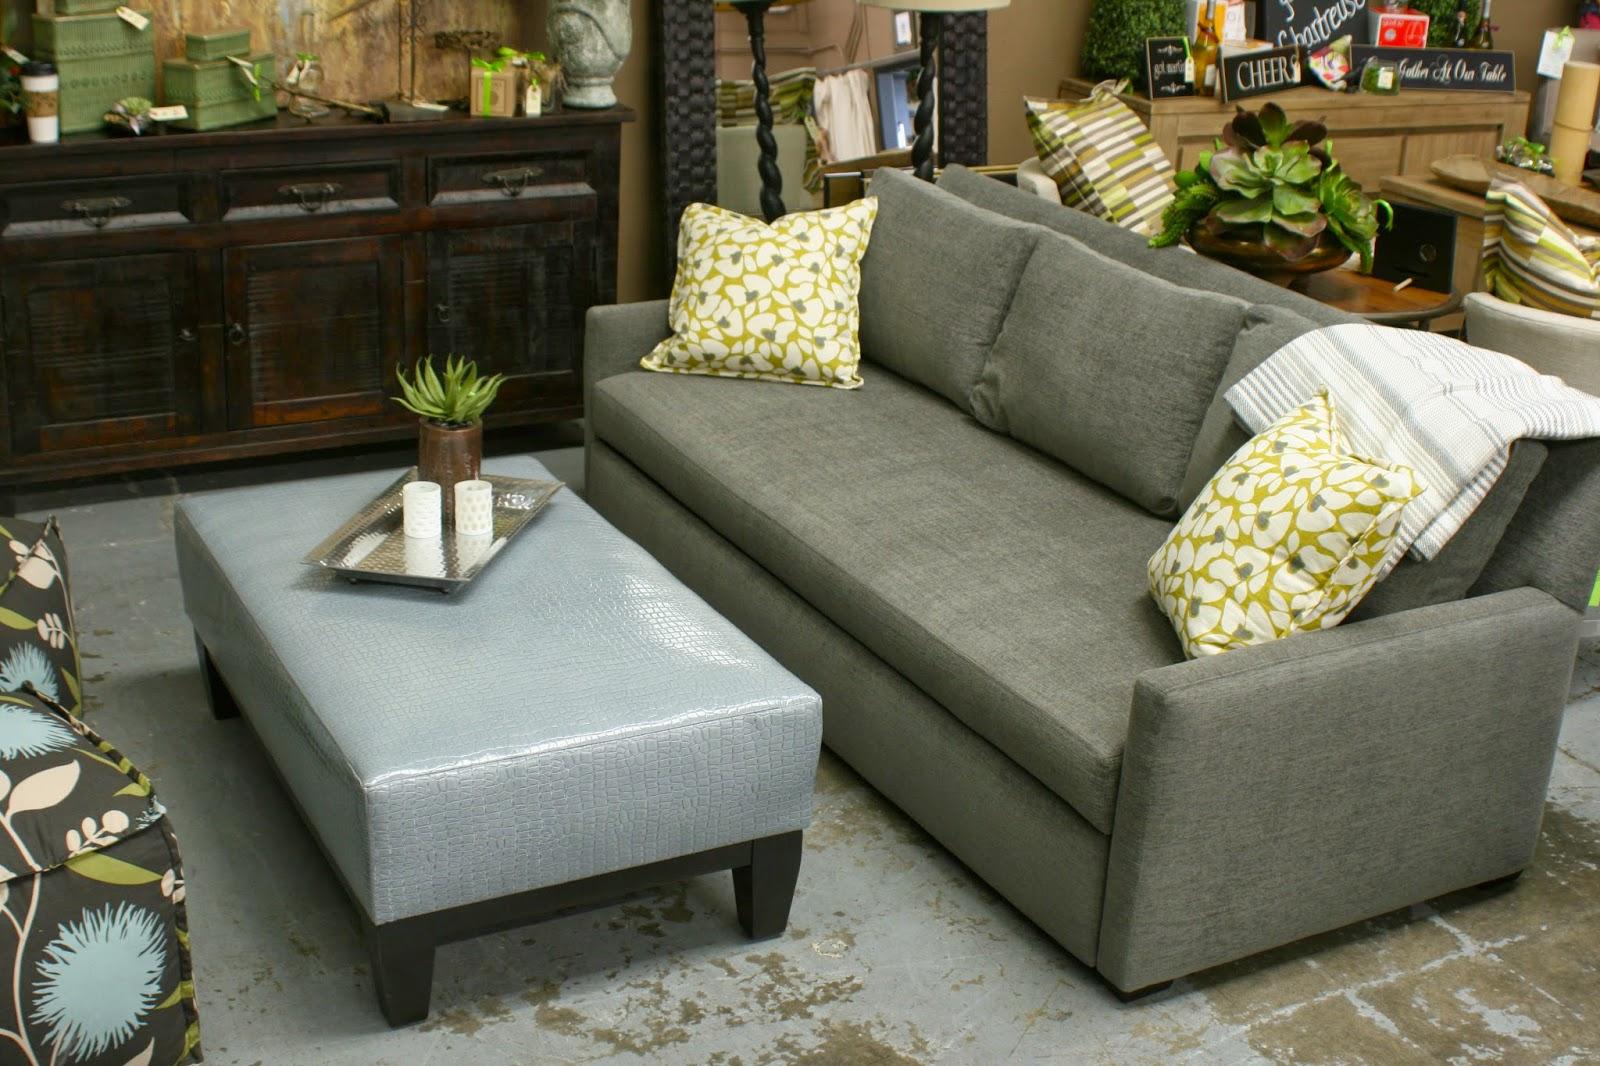 Chartreuse Home Furnishings LEE Did It Again - Lee sleeper sofa